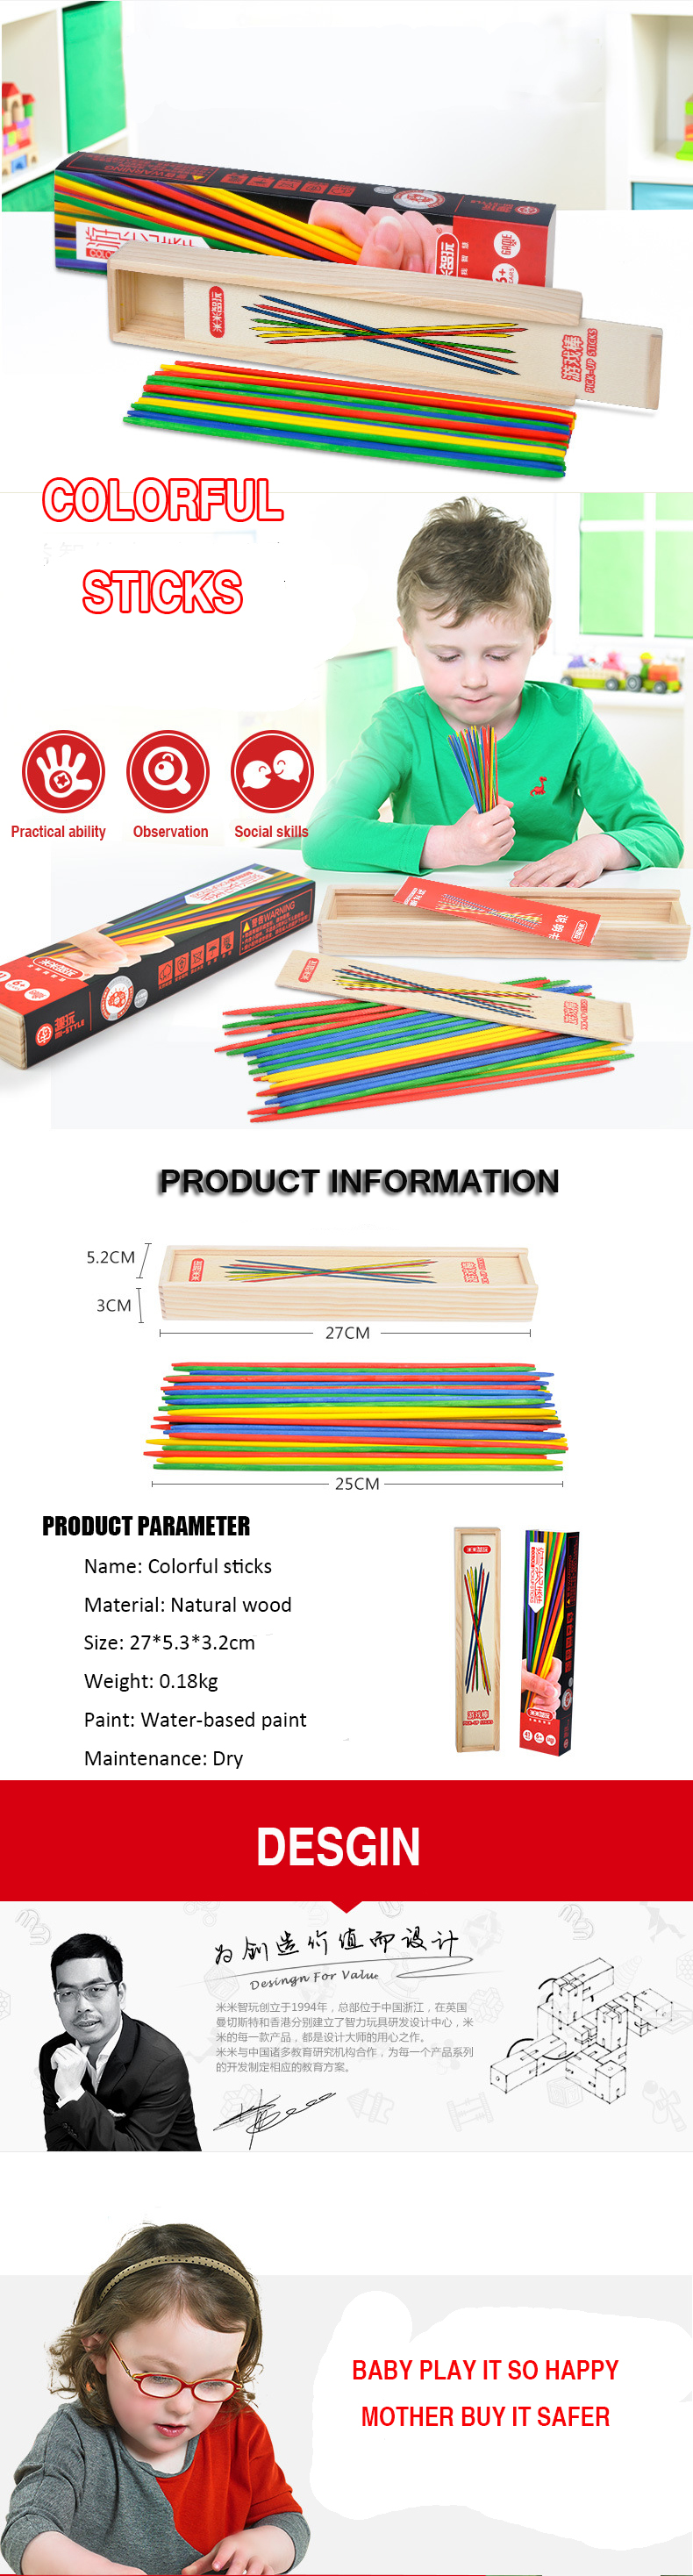 Stems Colorful Sticks Kids Toy Kindergarten Diy Handcraft Wood Toy